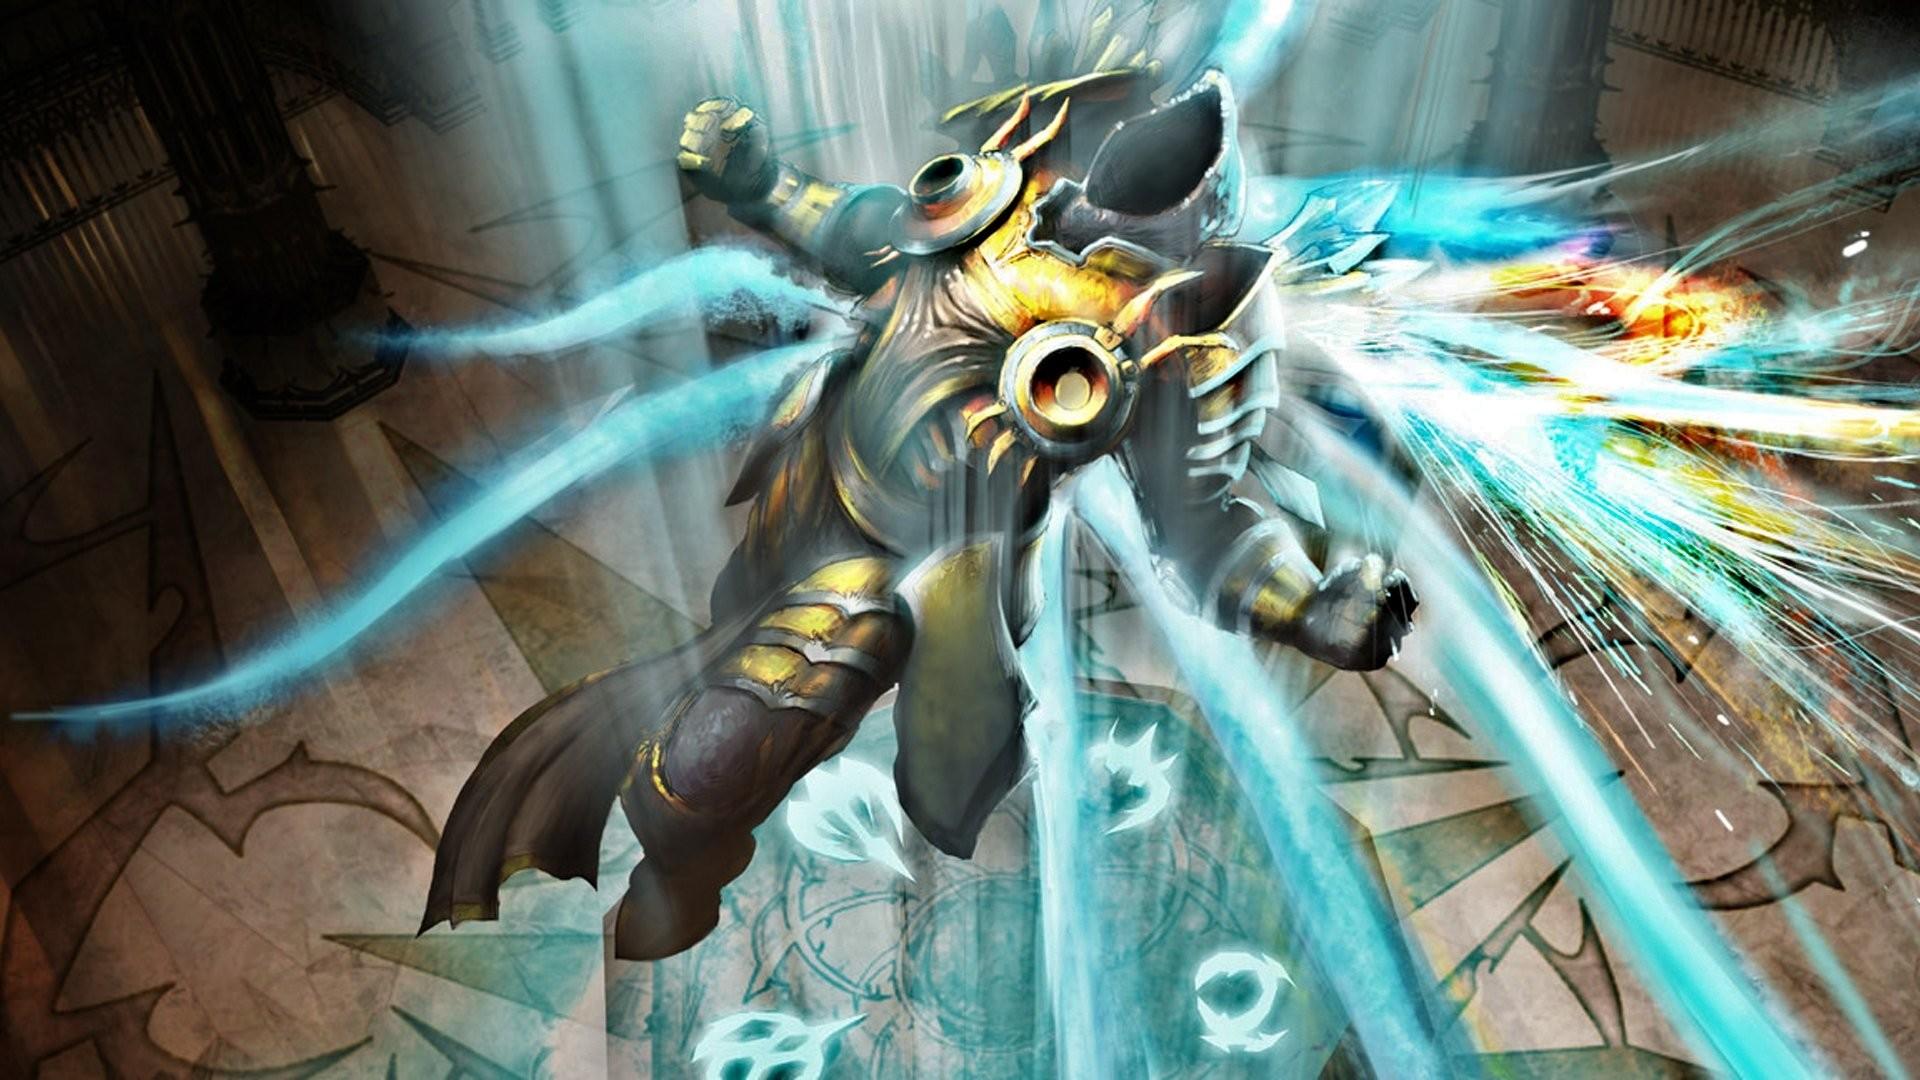 Angels Diablo Tyrael artwork wallpaper | | 313133 | WallpaperUP